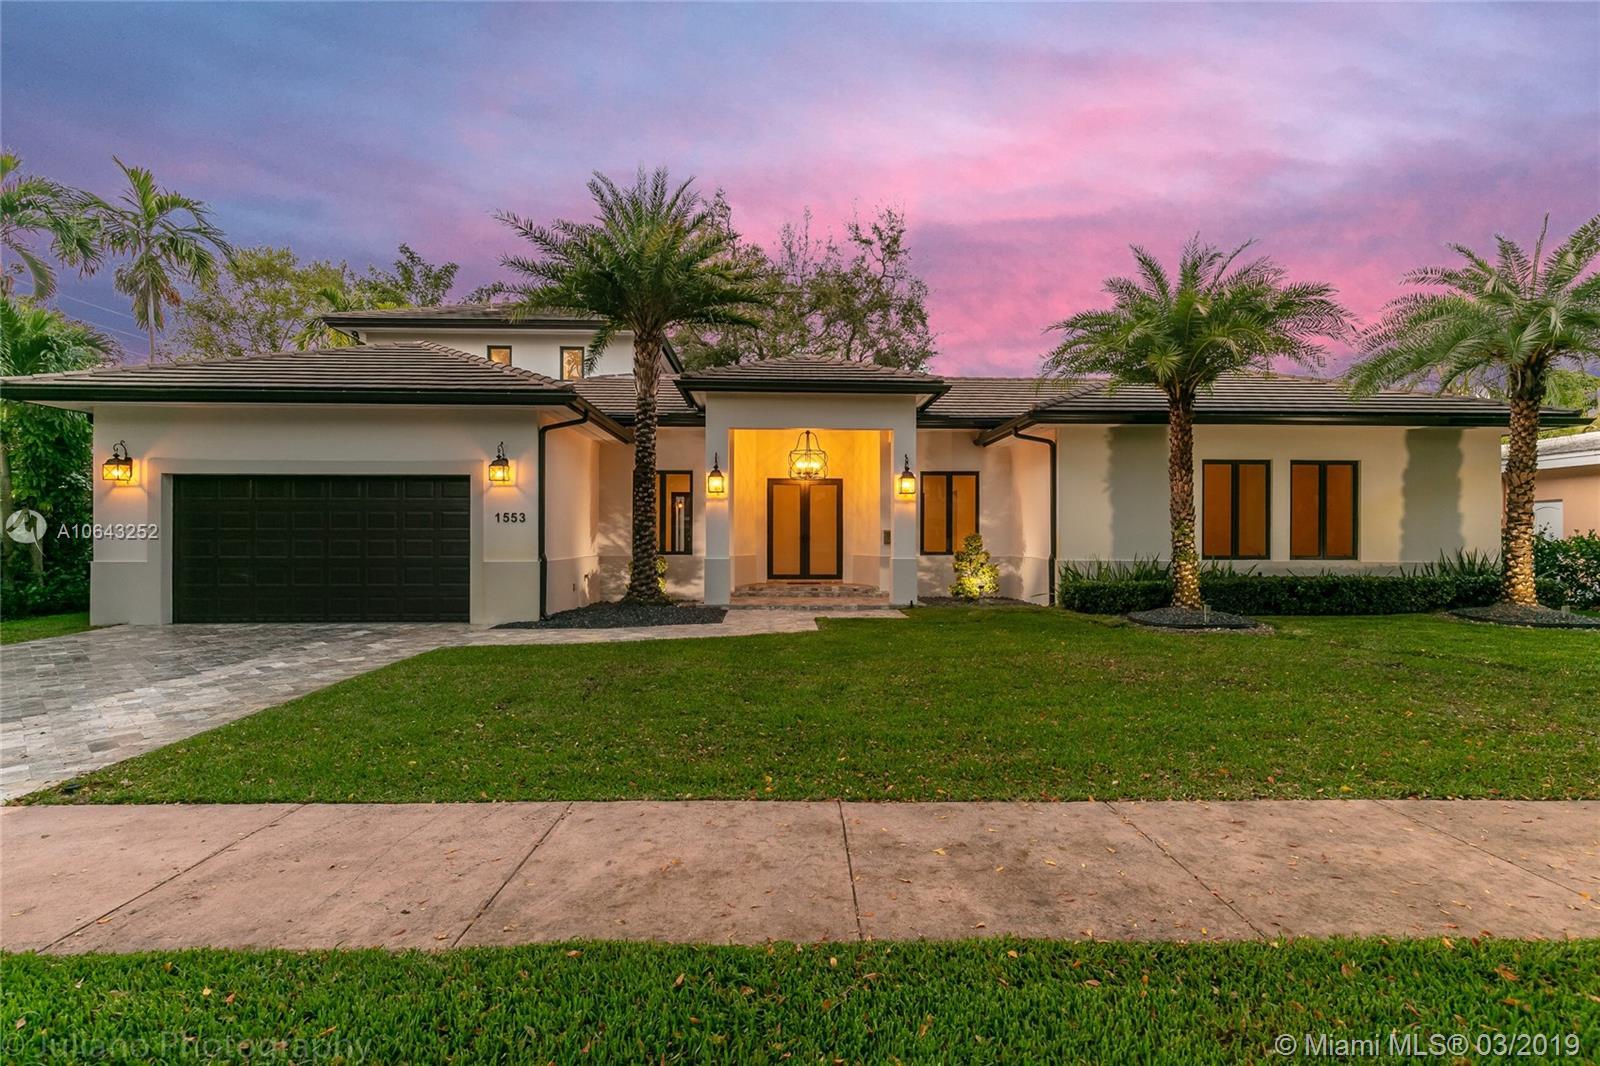 1553 Murcia Ave, Coral Gables, FL 33134